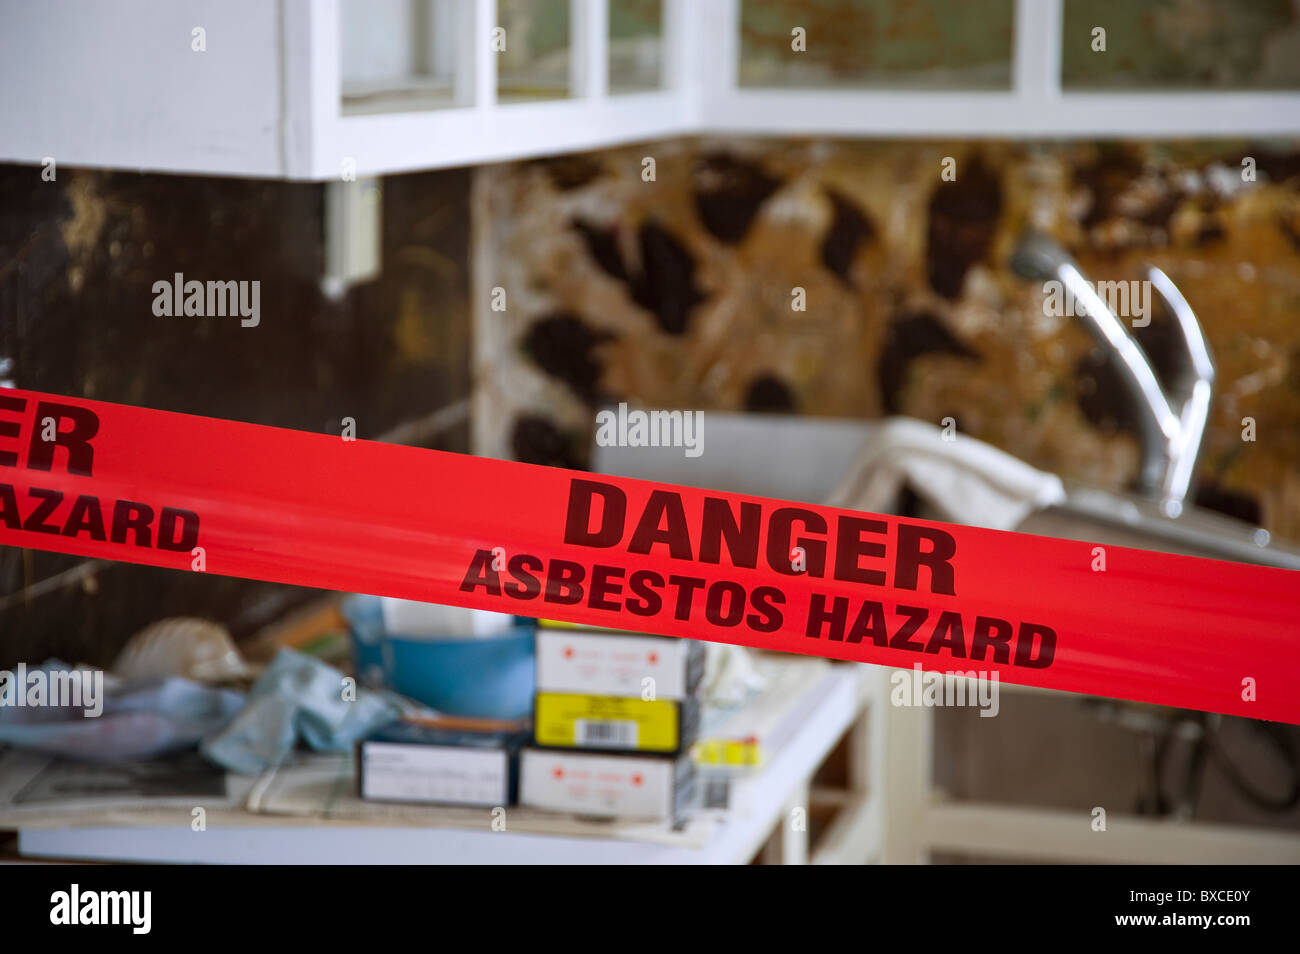 Asbestos Danger In Home - Stock Image